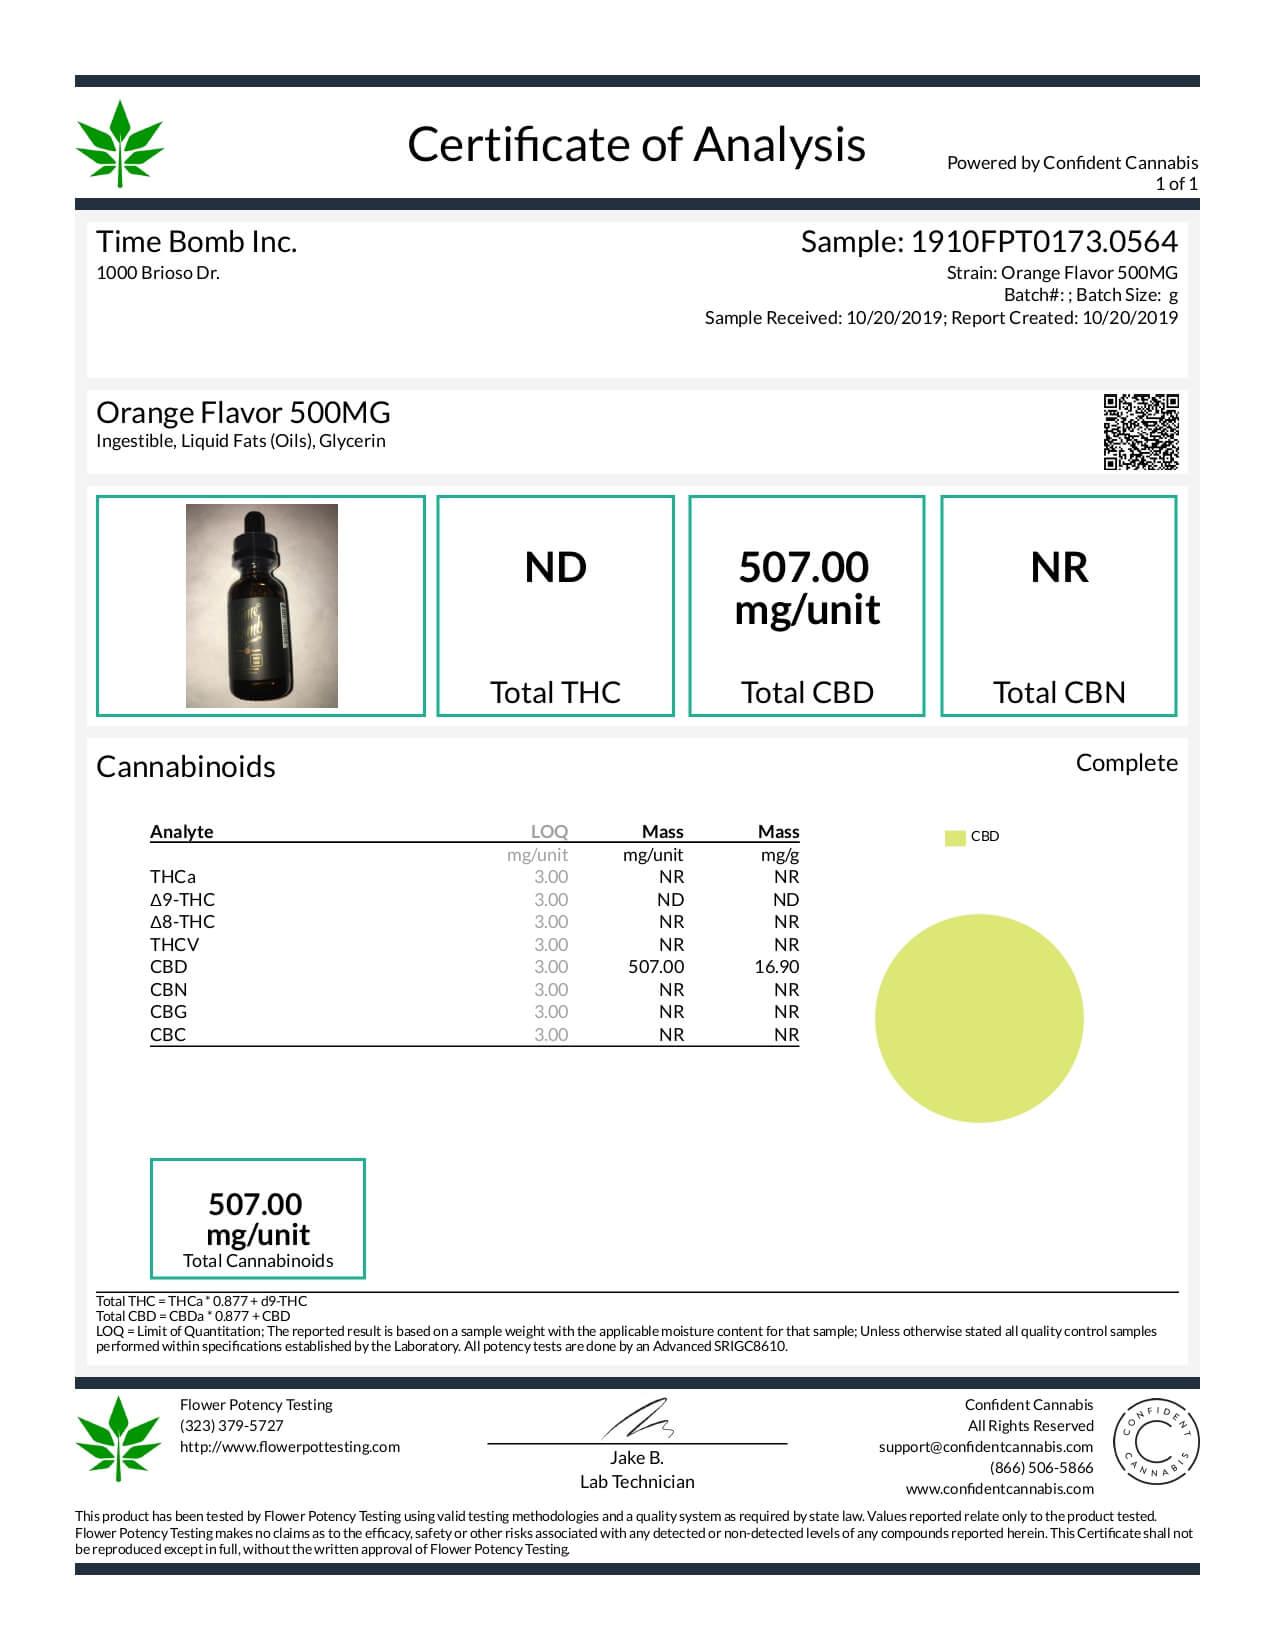 Time Bomb Extracts CBD Tincture Orange 500mg Lab Report